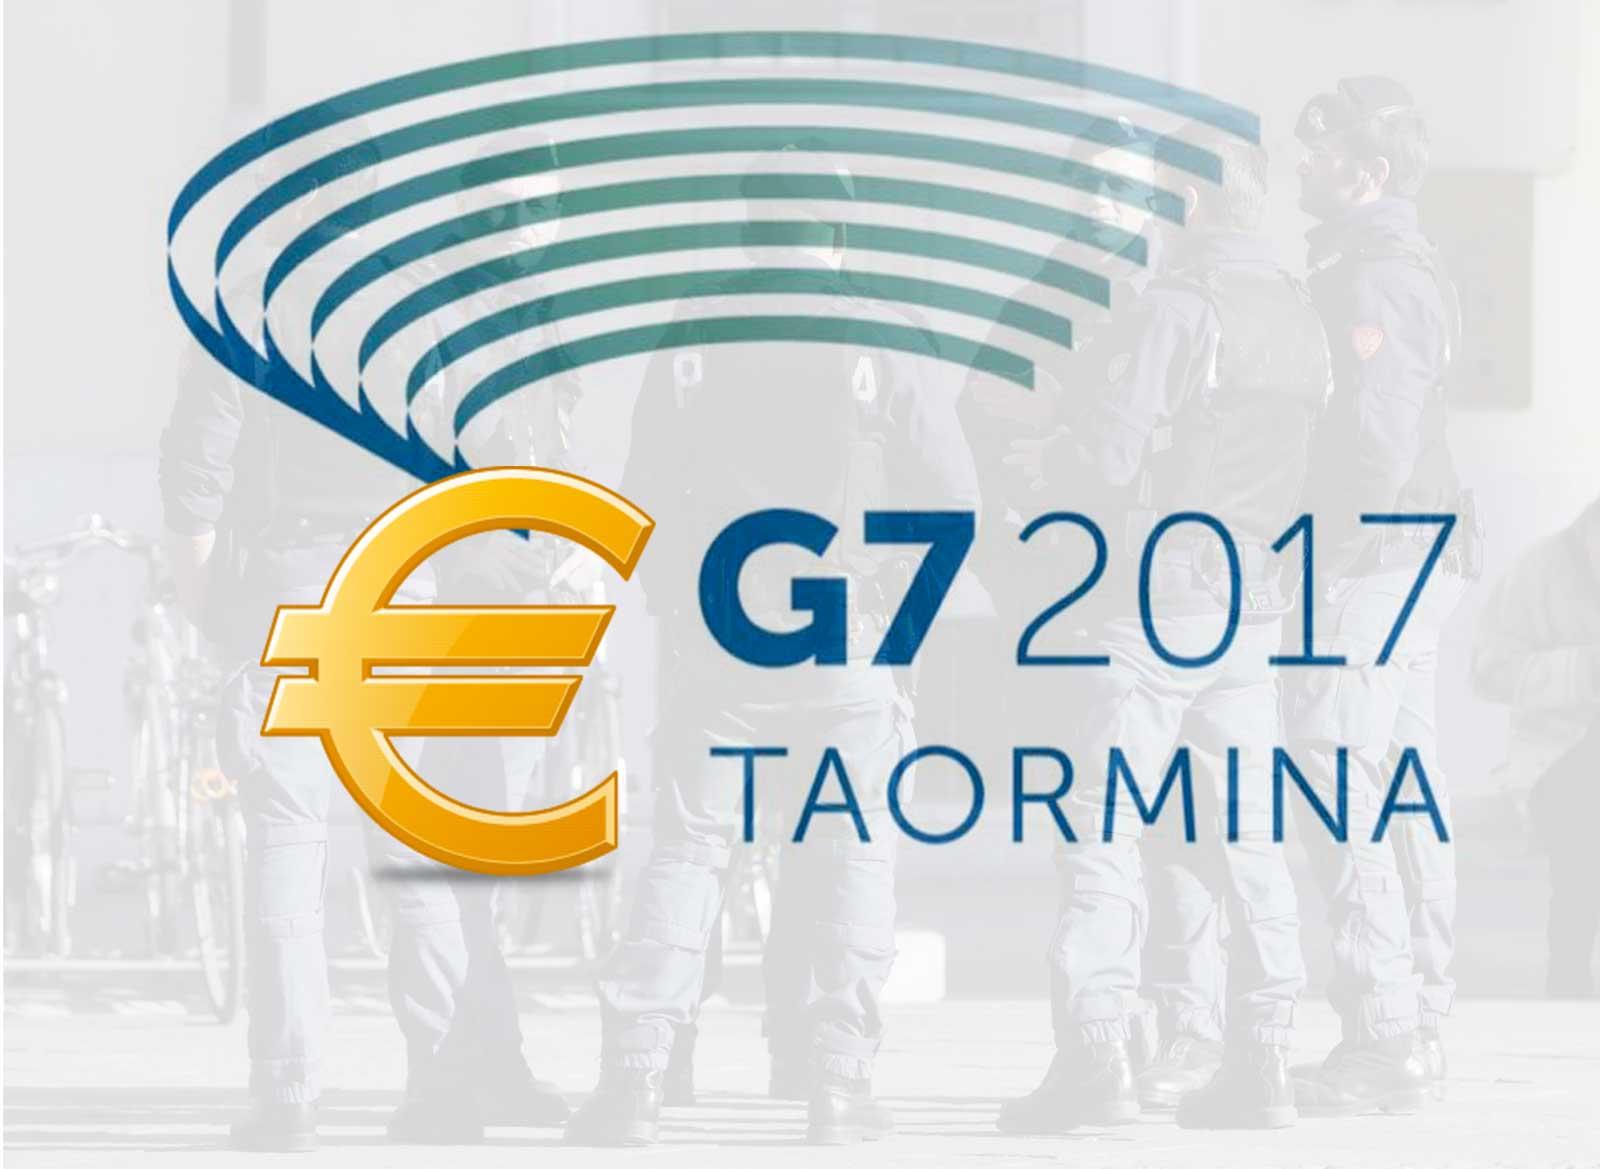 G7 Taormina polizia di stato